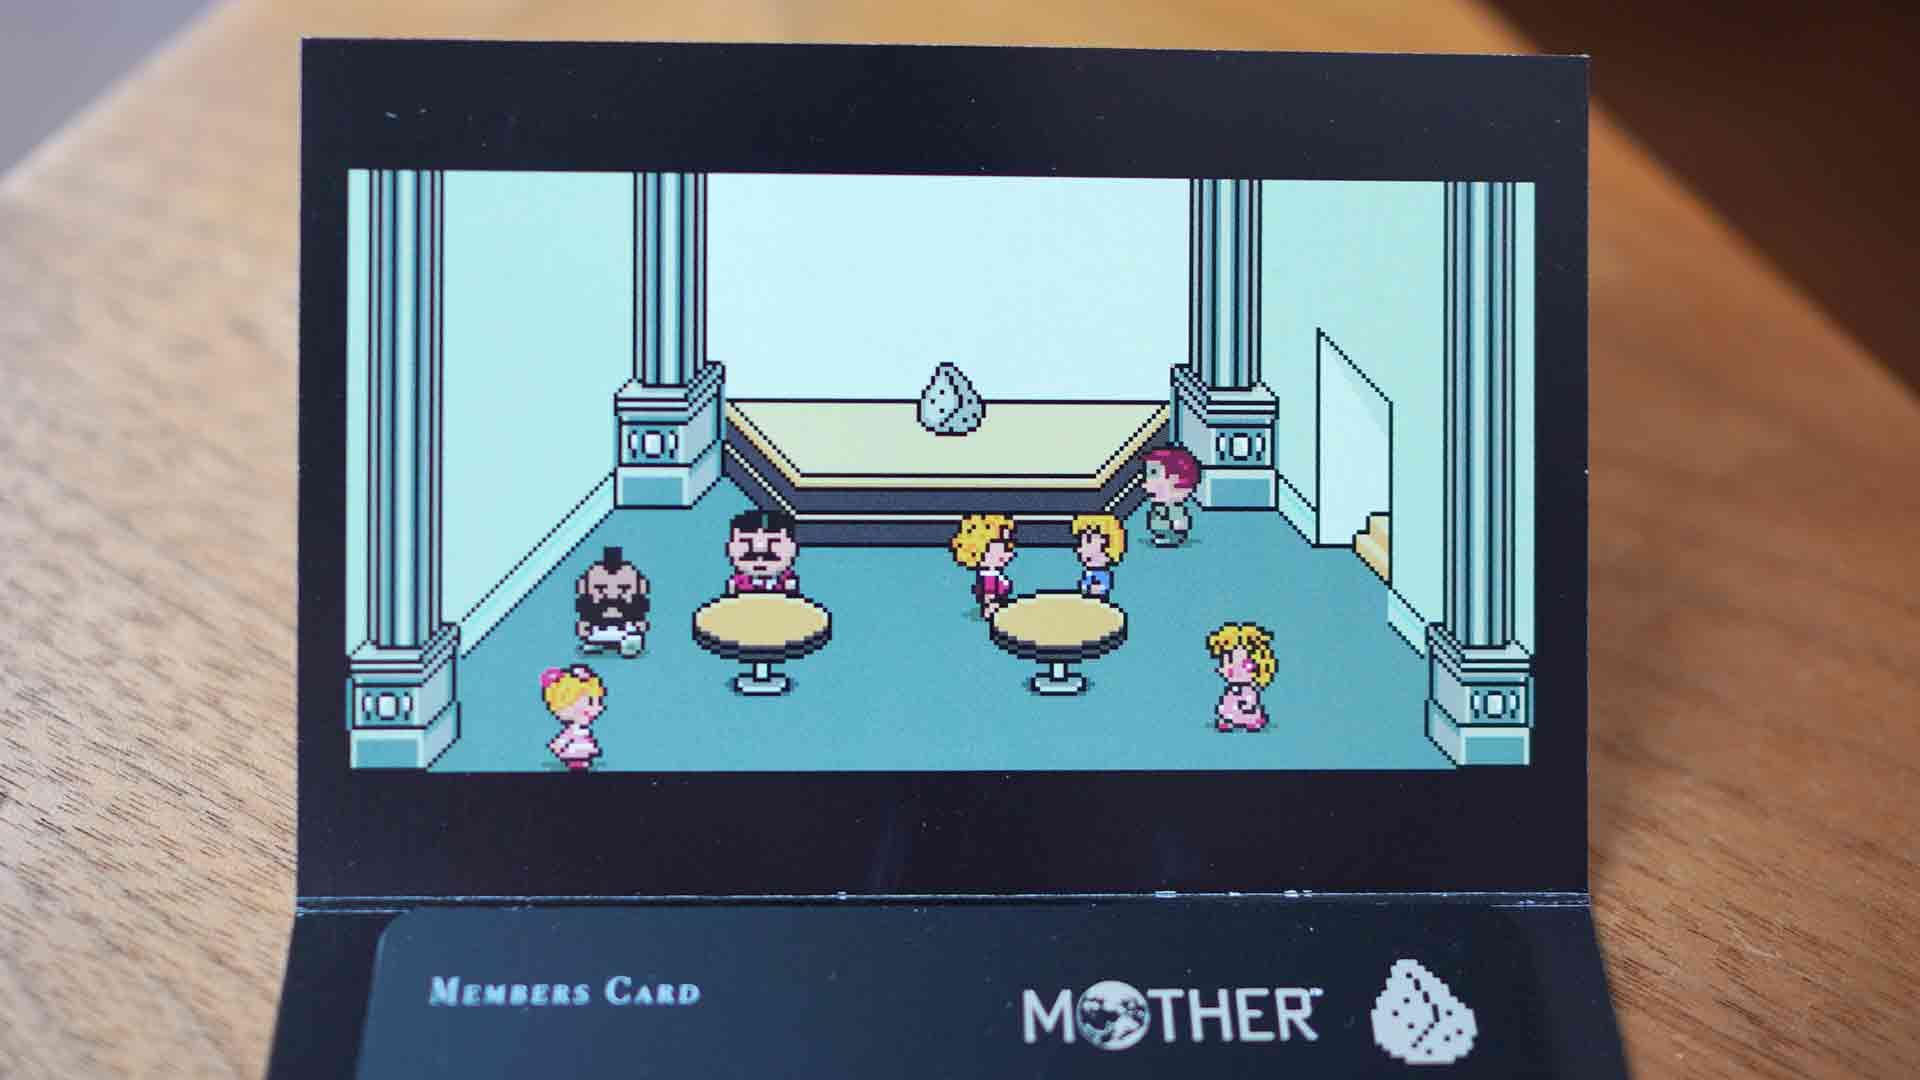 MOTHER2,MOTHERのひろば,ほぼ日,渋谷パルコ,イベント,レトロゲーム,ストイッククラブ